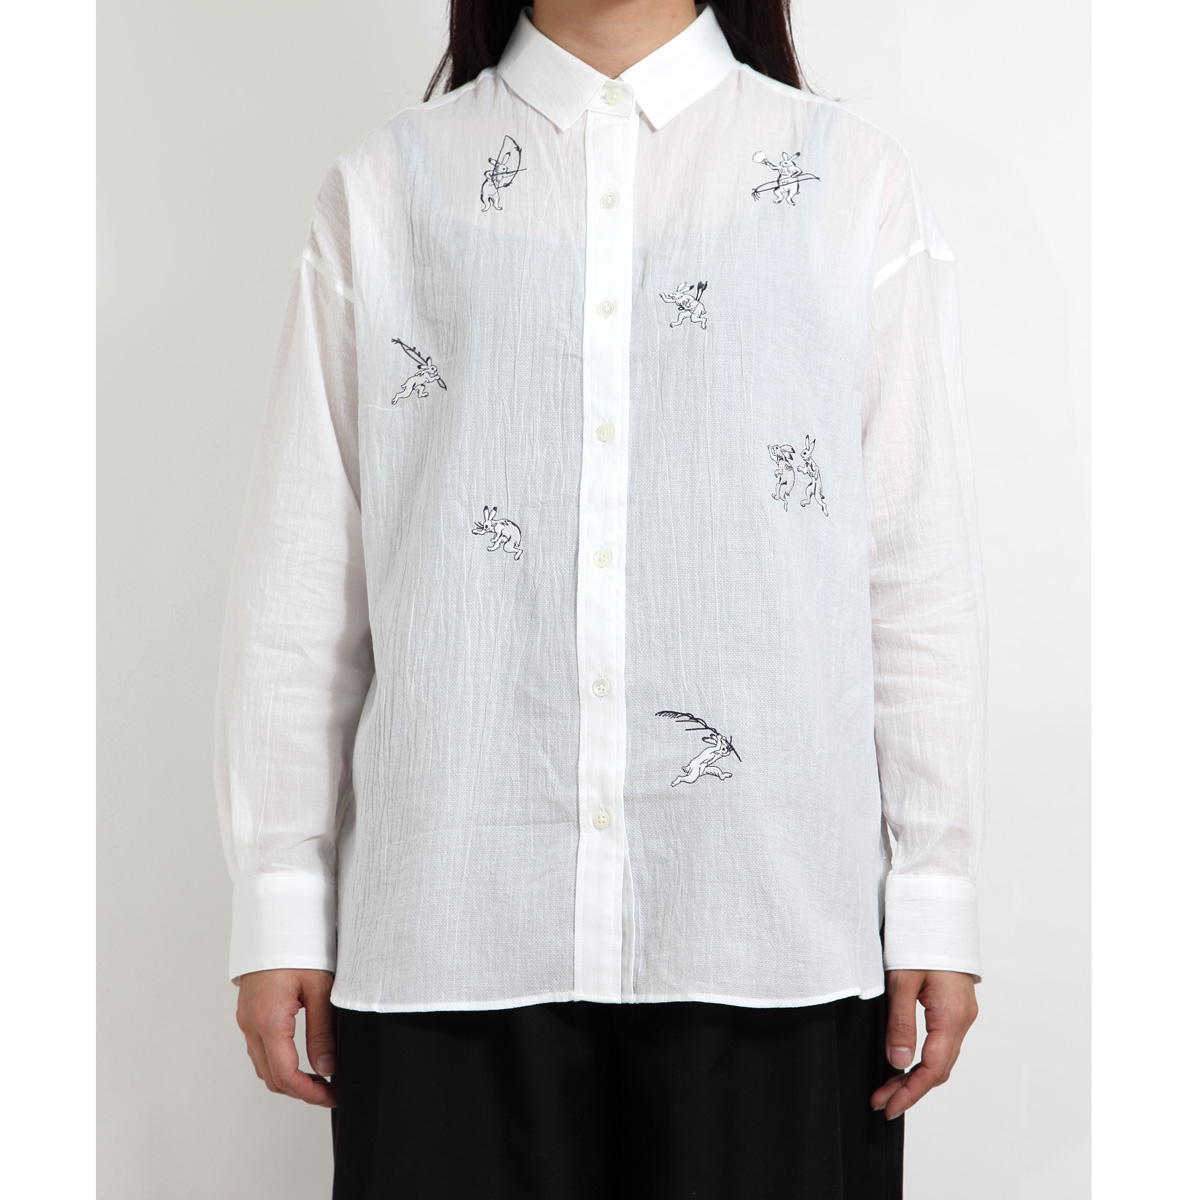 KY17-672/ドビーシャツ[播州織]/兎